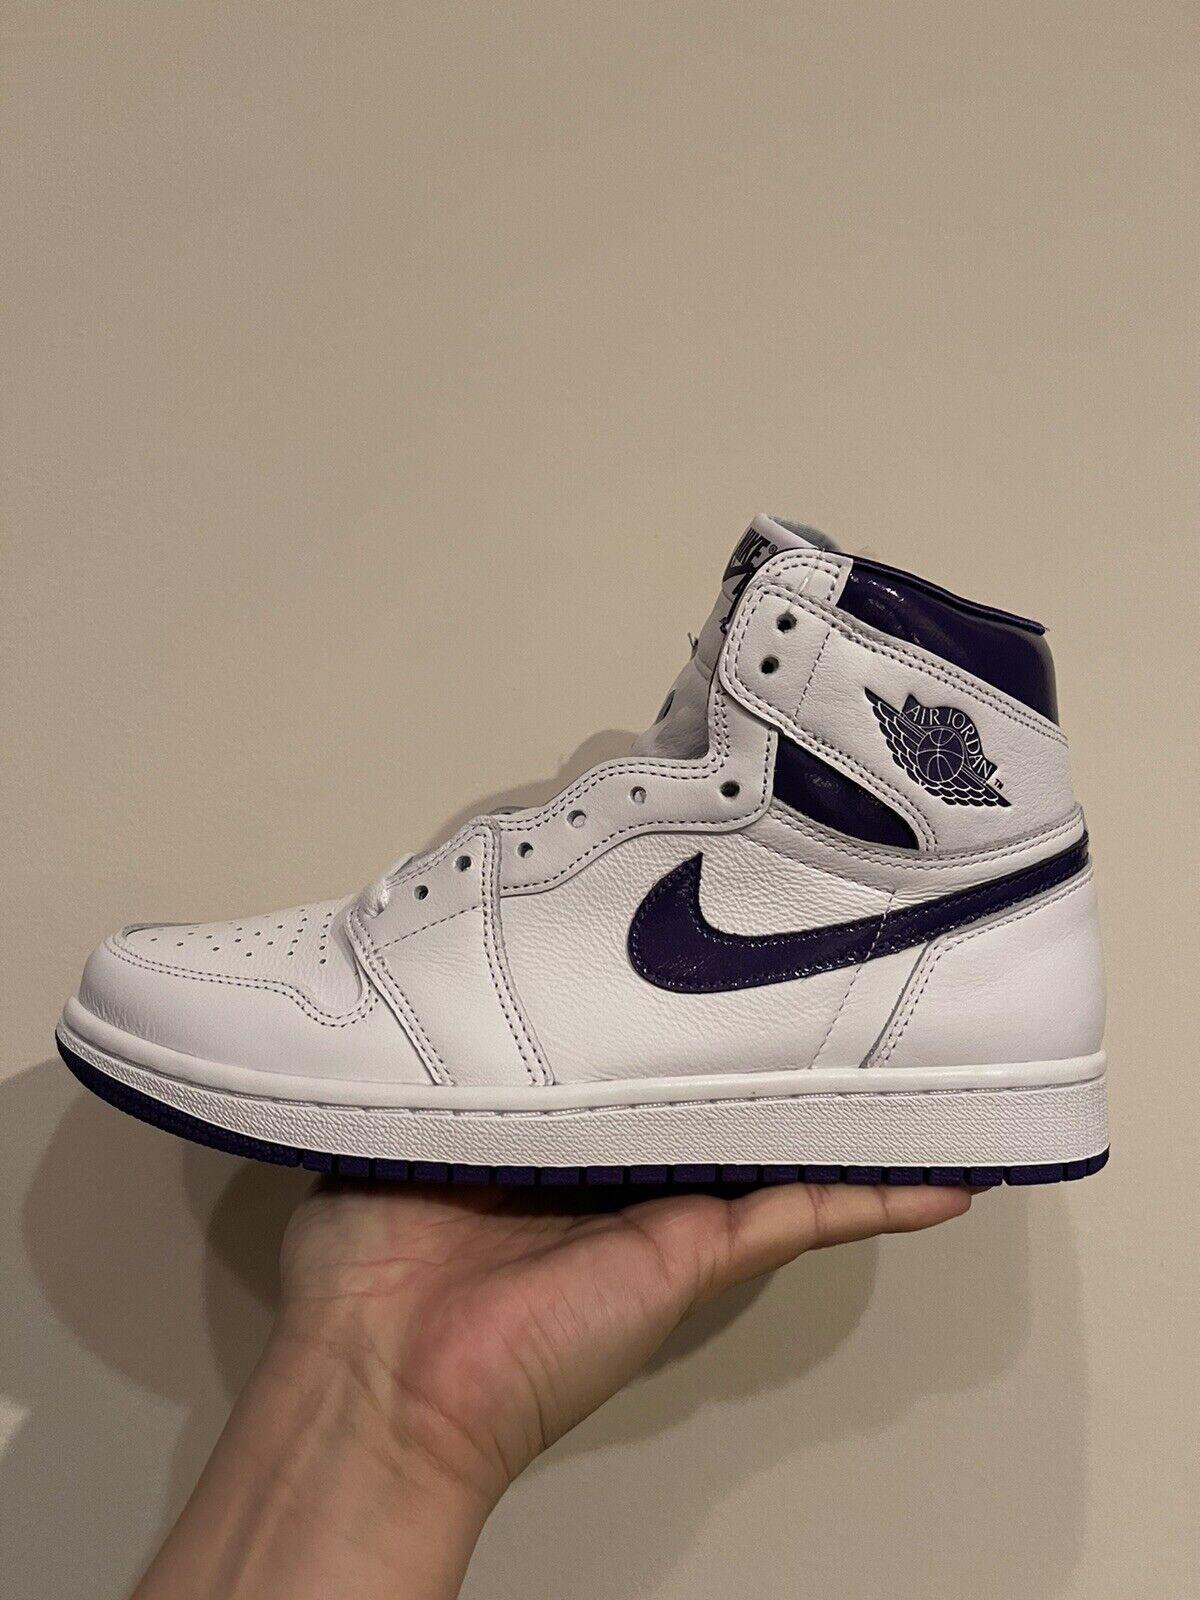 Jordan 1 Retro High Court Purple 8.5W Brand New